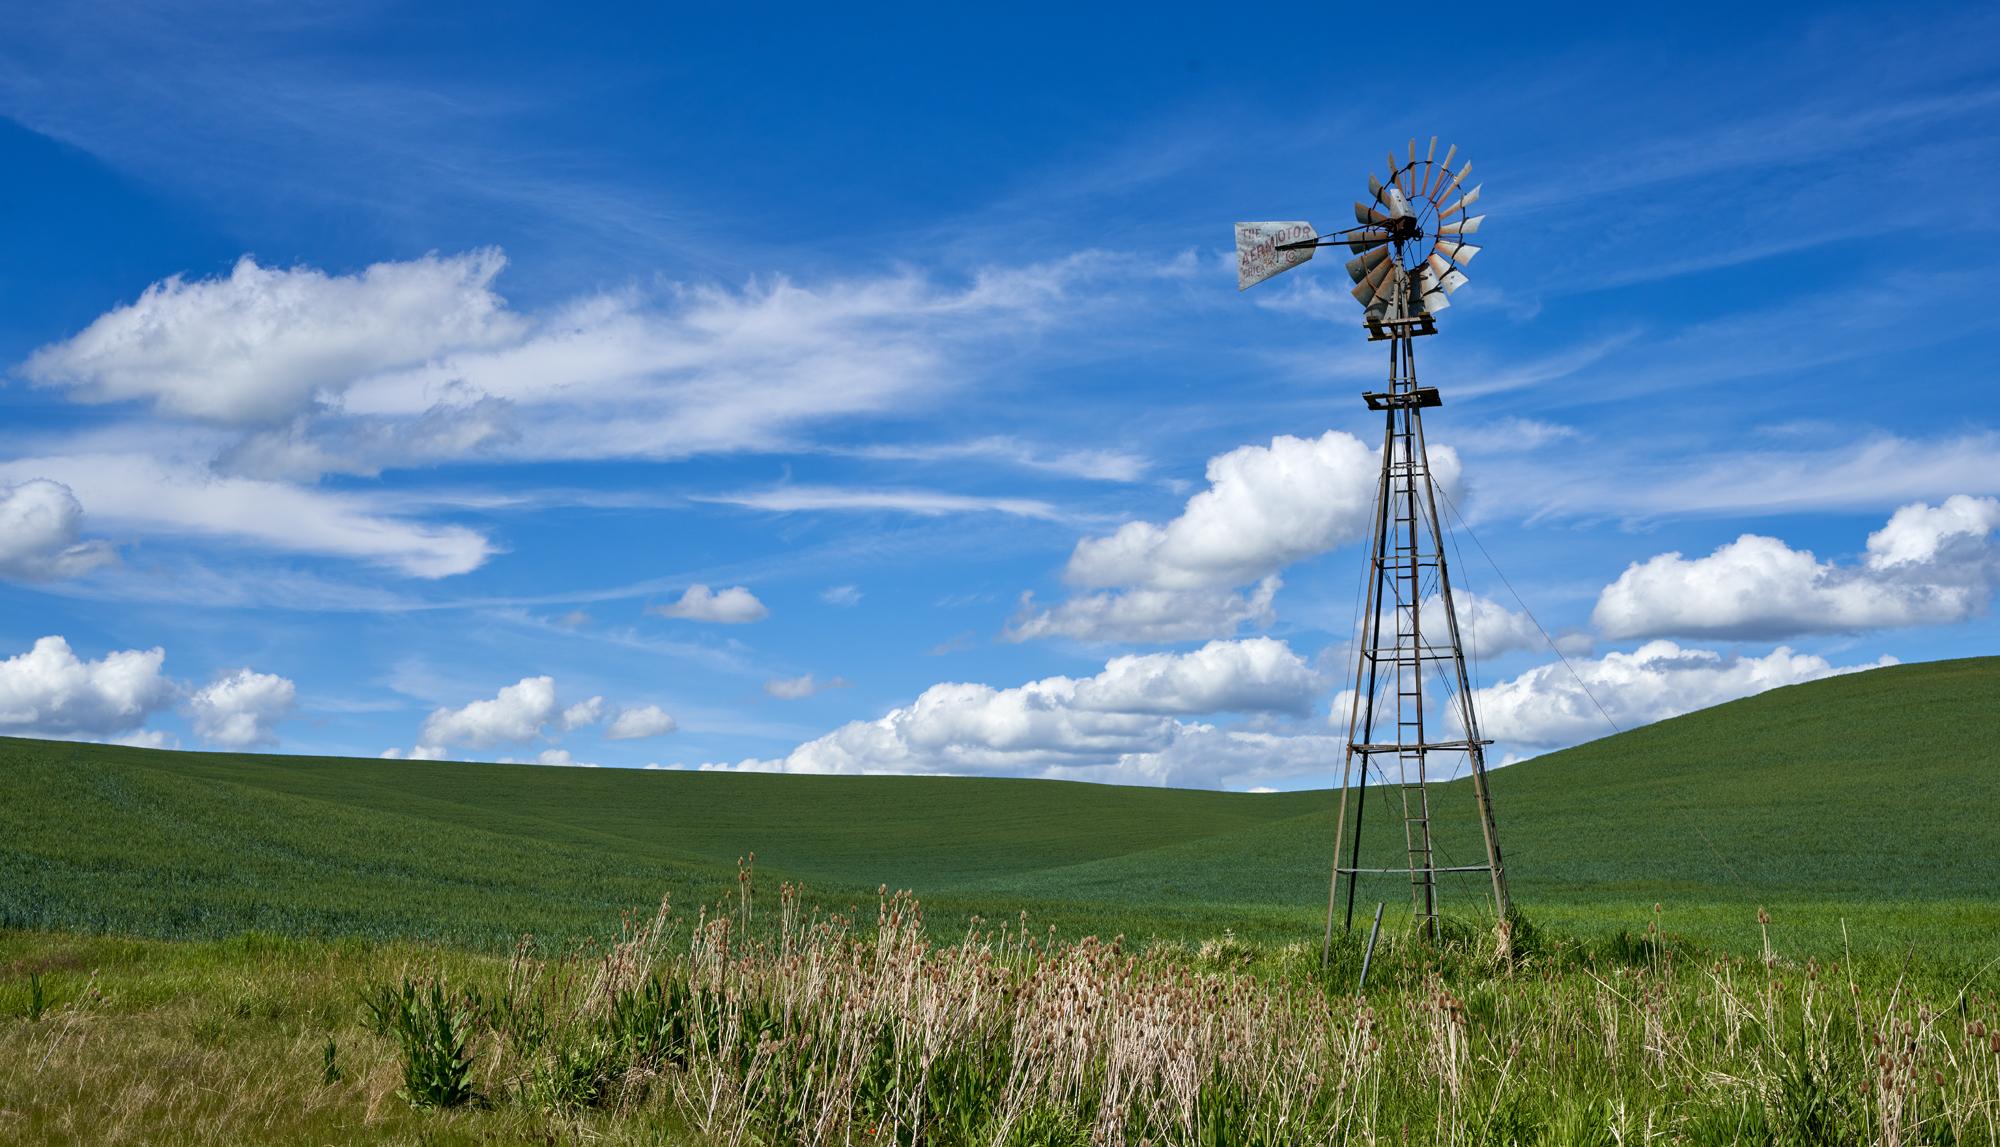 One of my favorite windmills